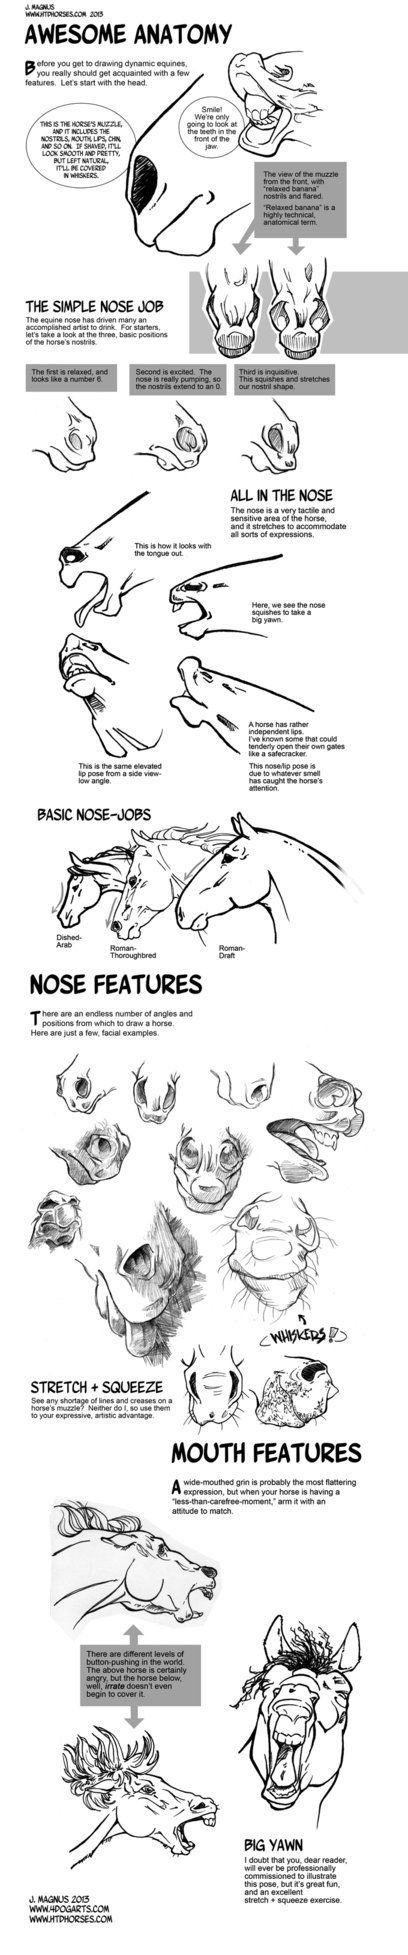 Horse Anatomy Part I by sketcherjak on DeviantArt | Learn to Draw ...